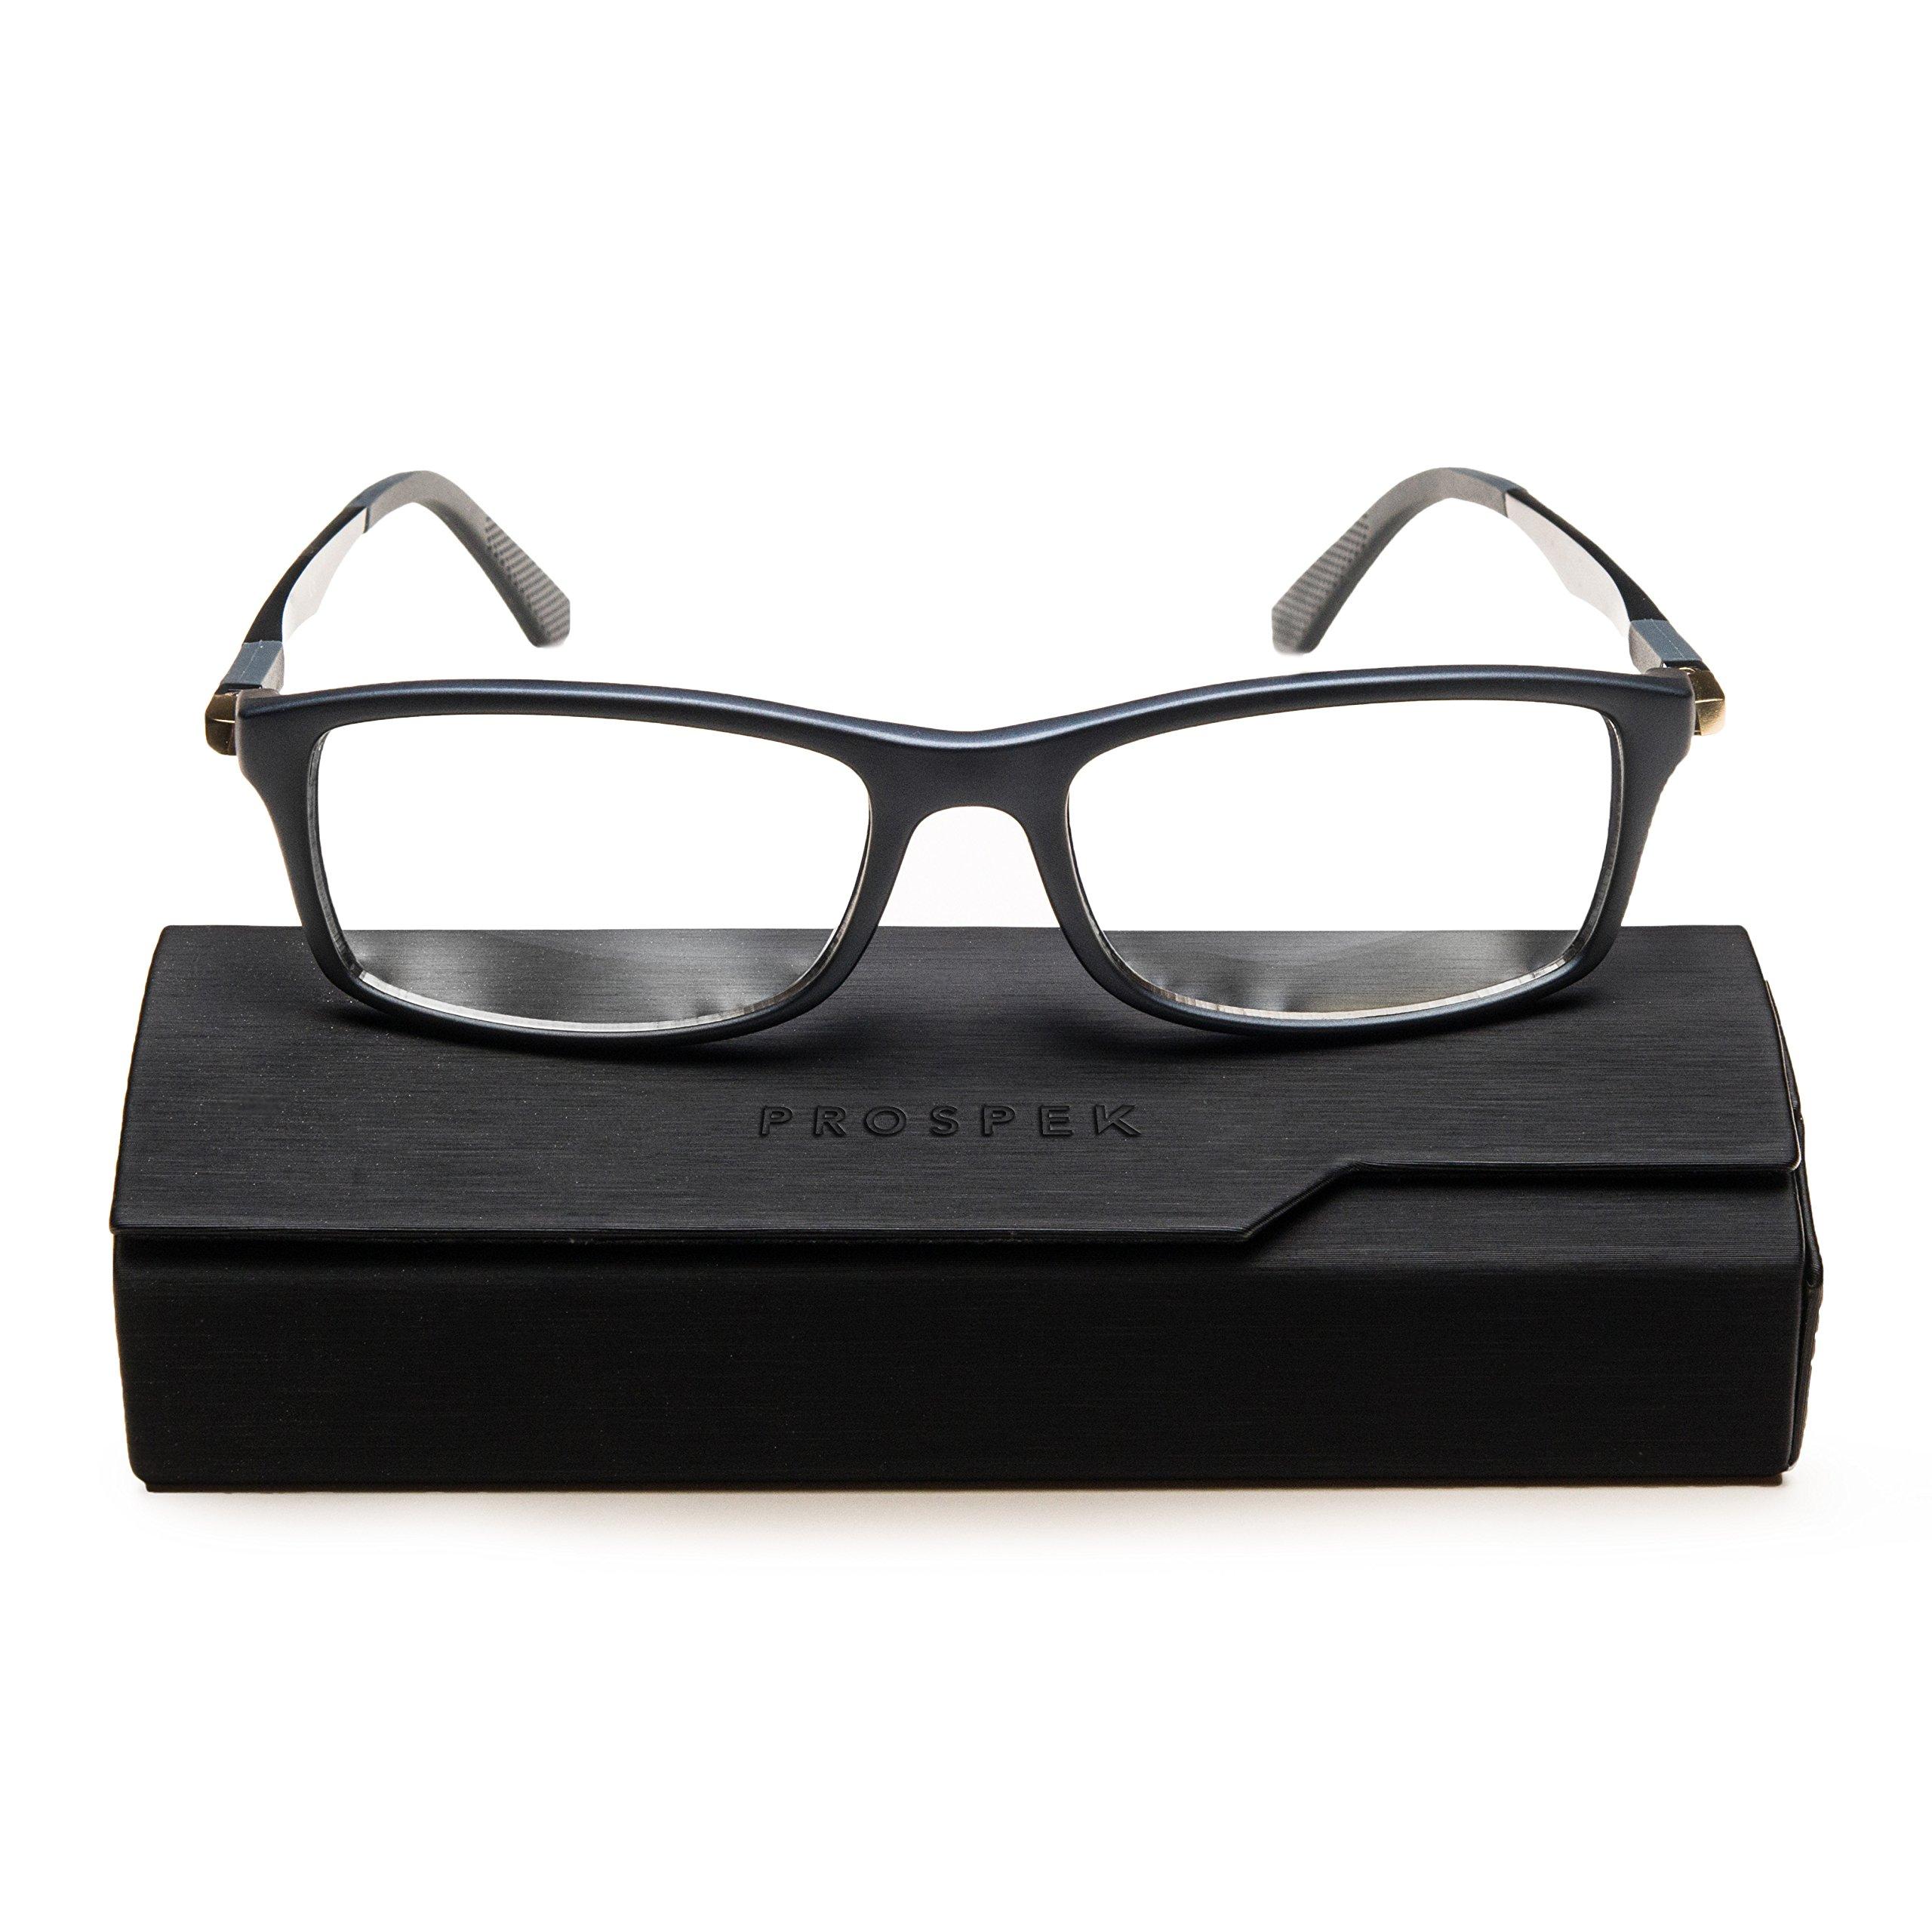 2b21481a3288 PROSPEK - Computer Glasses - Blue Light Blocking Glasses - Dynamic (+0.00  (No